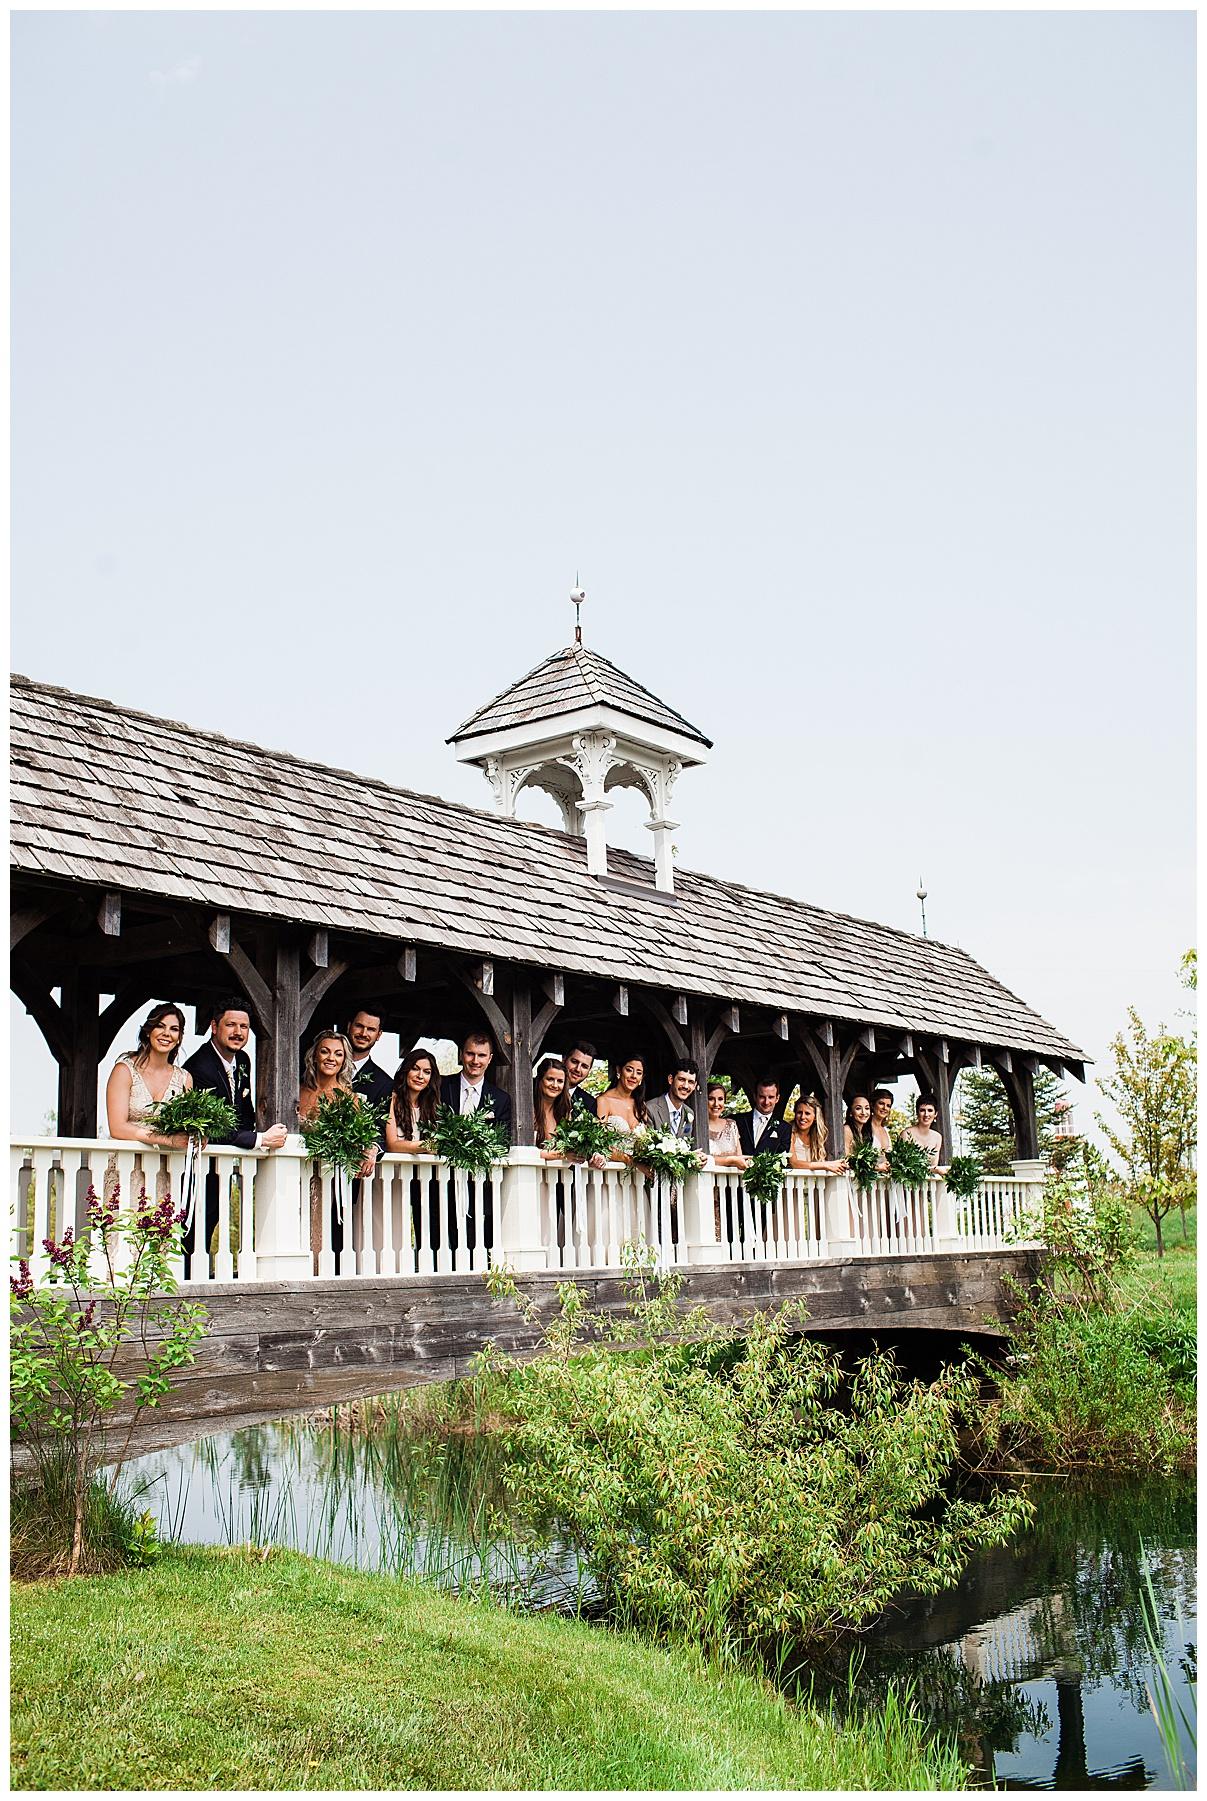 Bridal party leaning out over beautiful bridge|  Belcroft Estate Wedding| Toronto wedding photographer| Ontario wedding photographer| 3photography